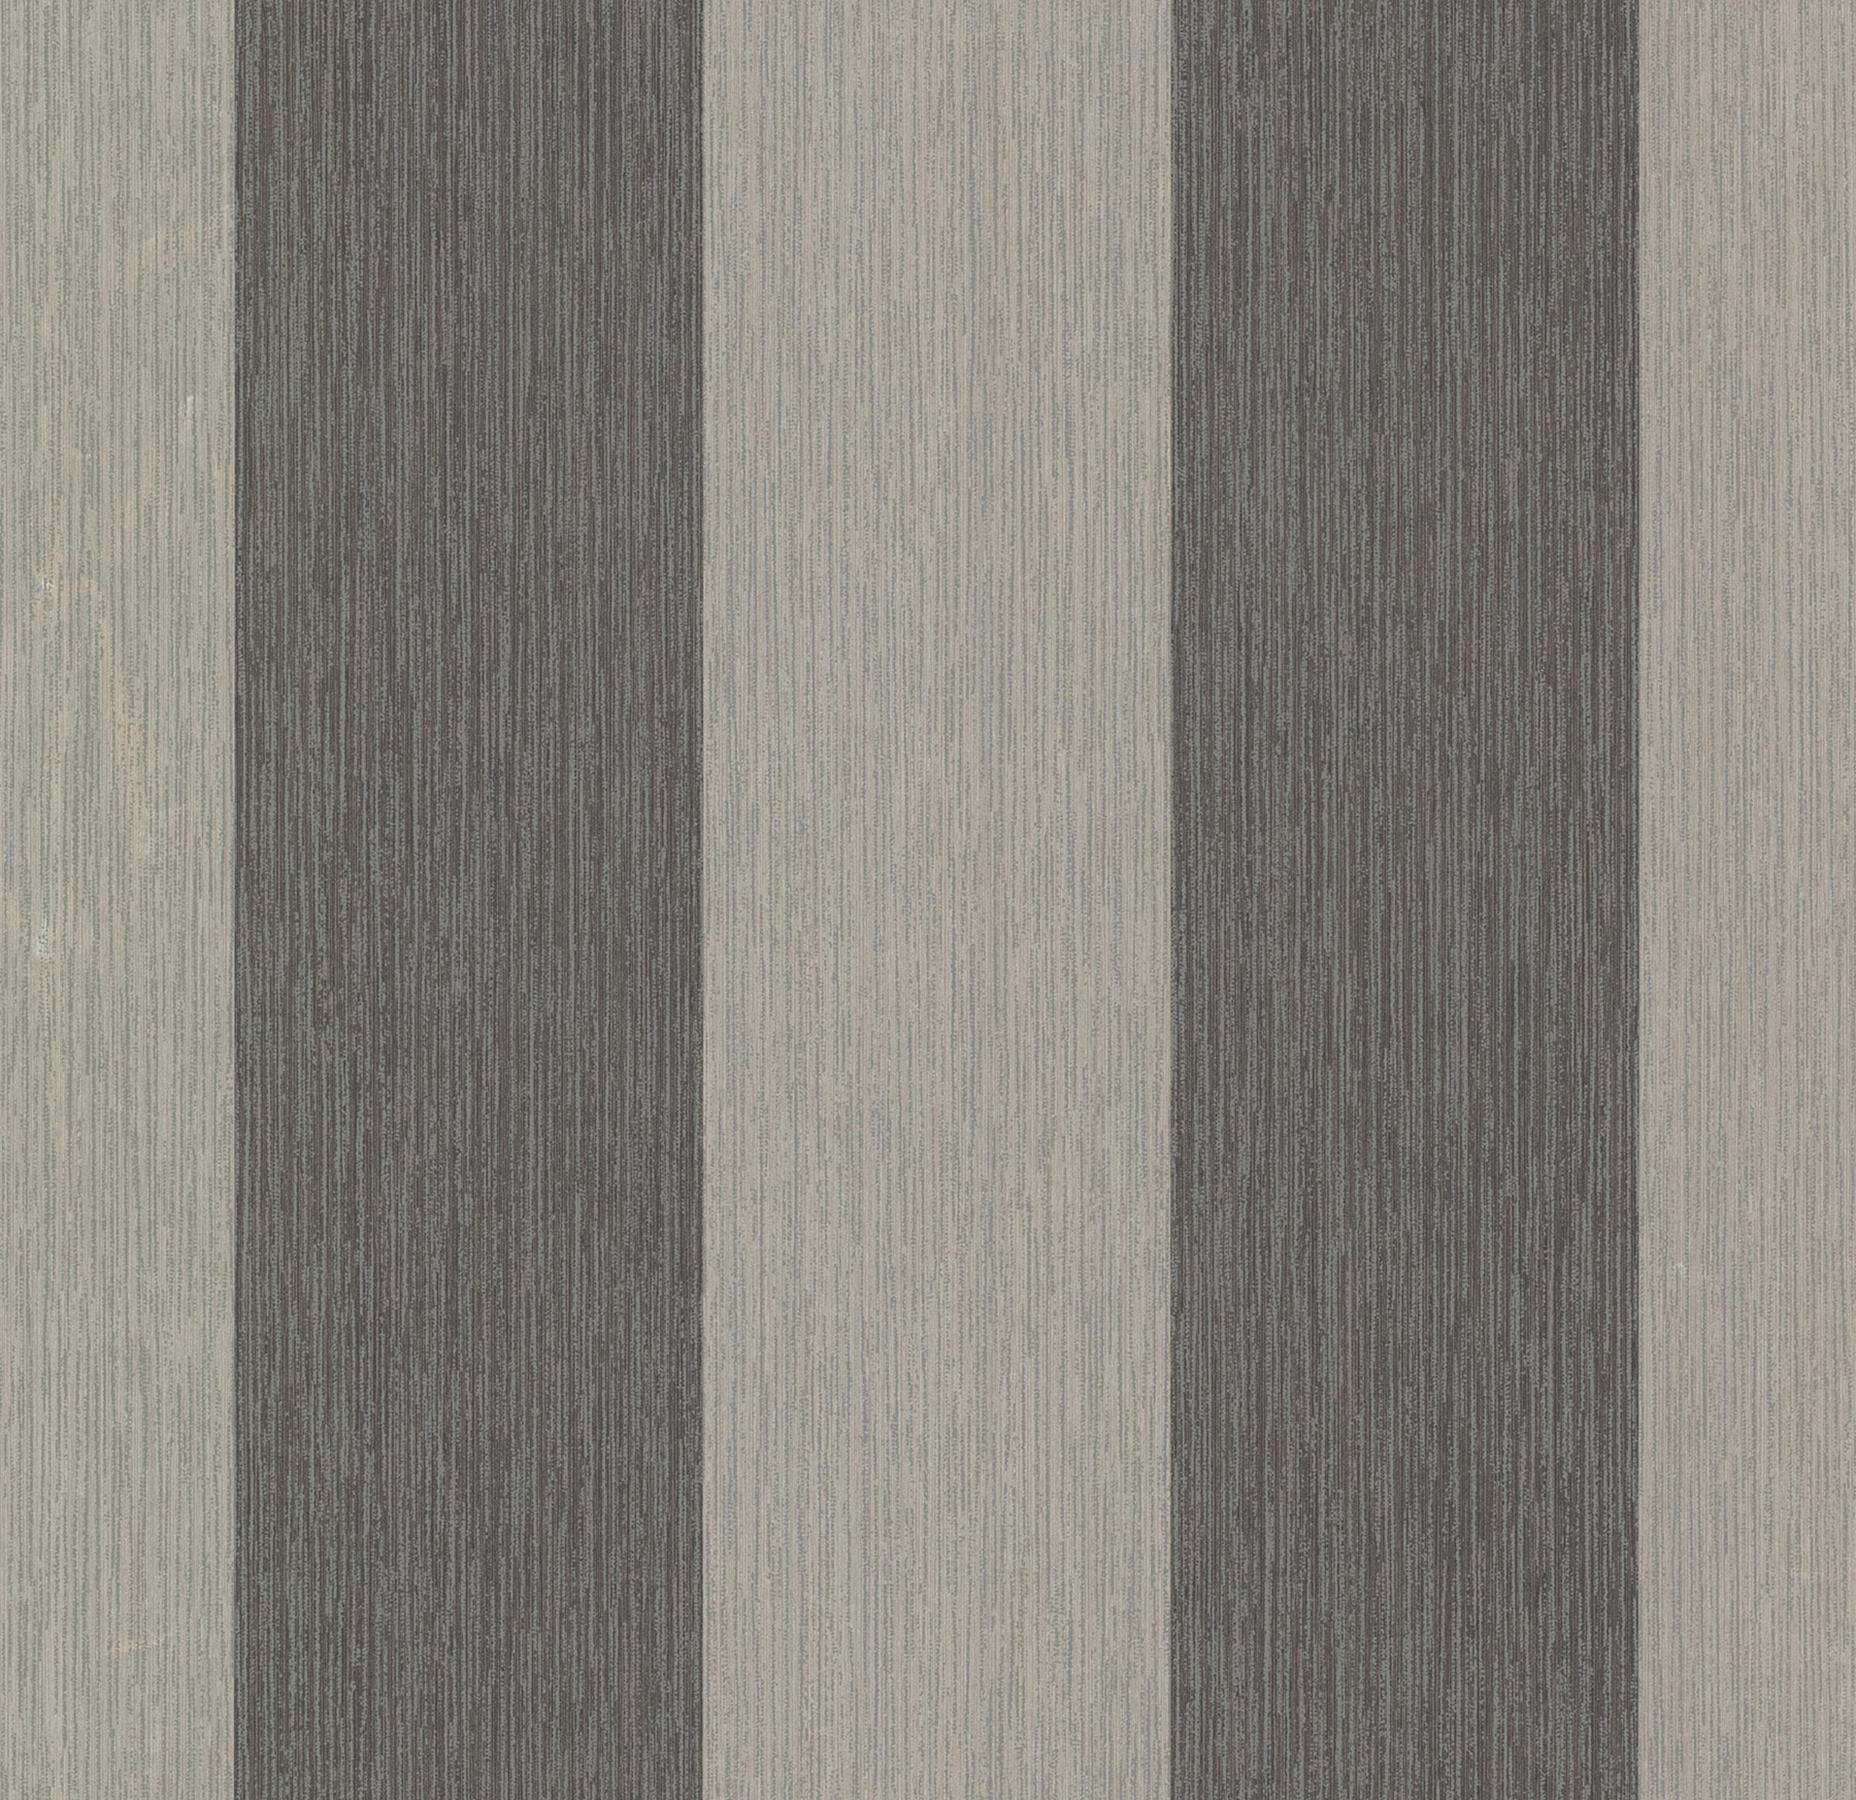 Picture of Ardor Black Stripe Wallpaper